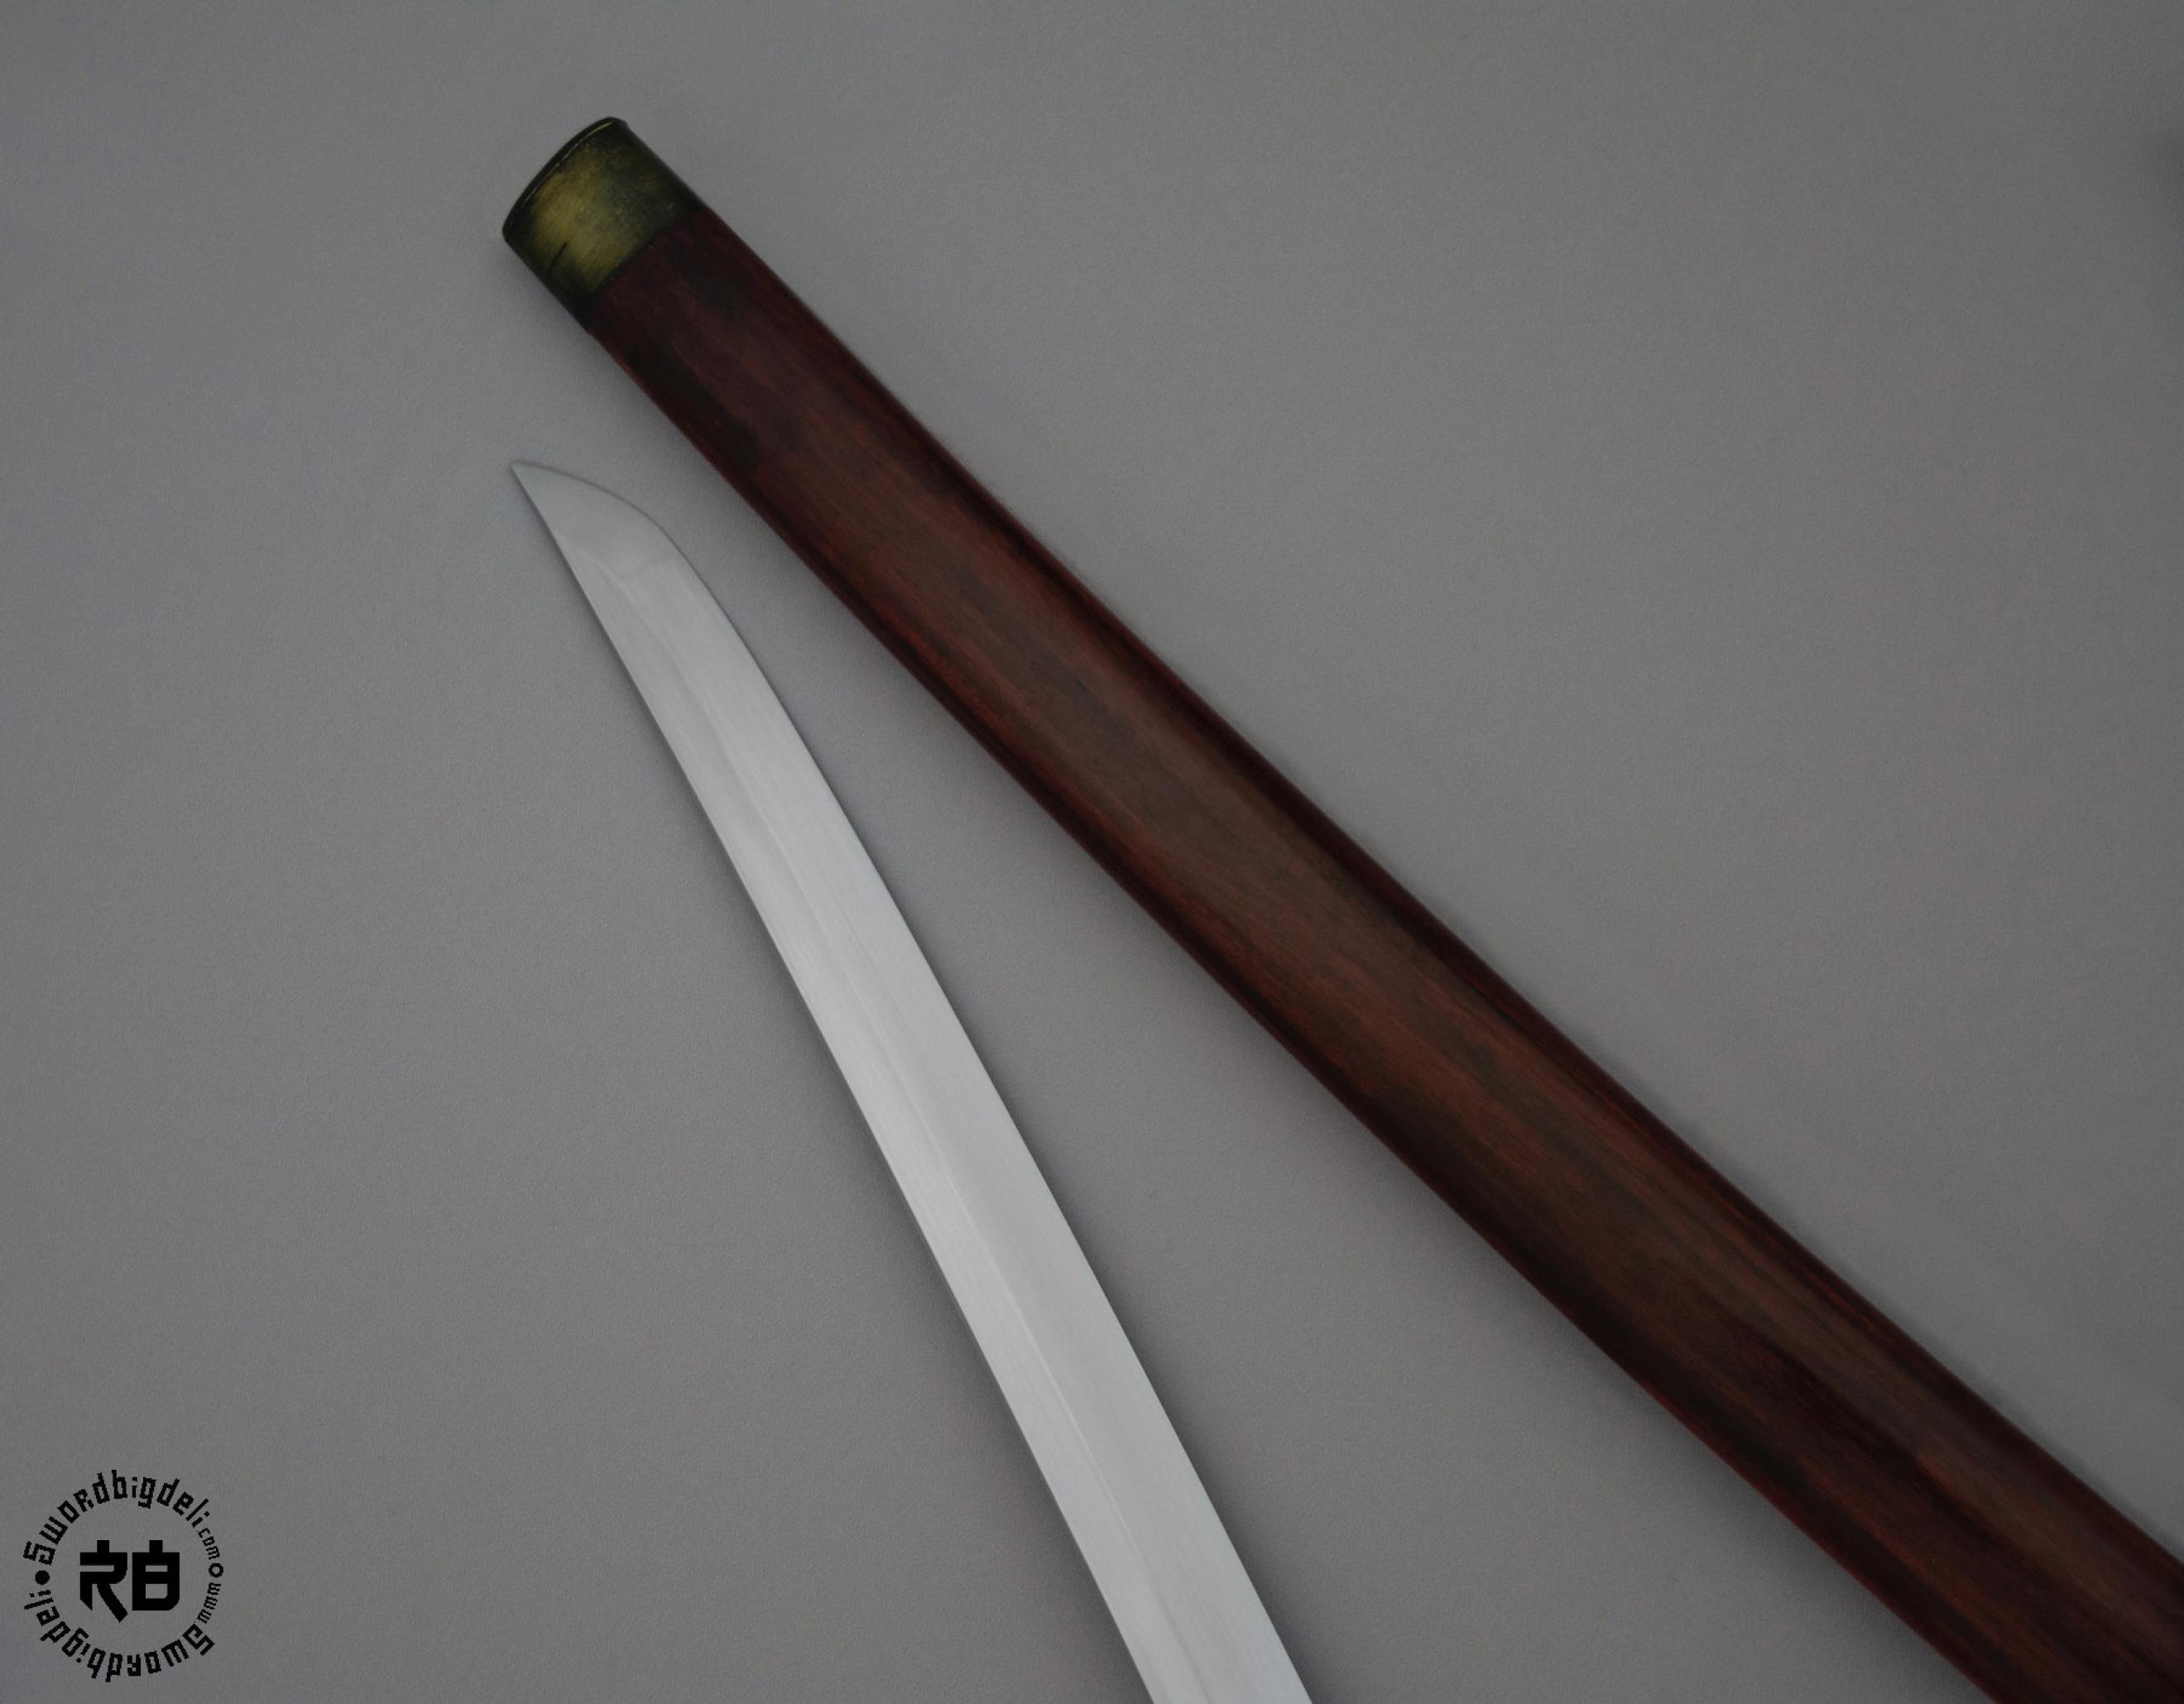 Fujiwara Katana